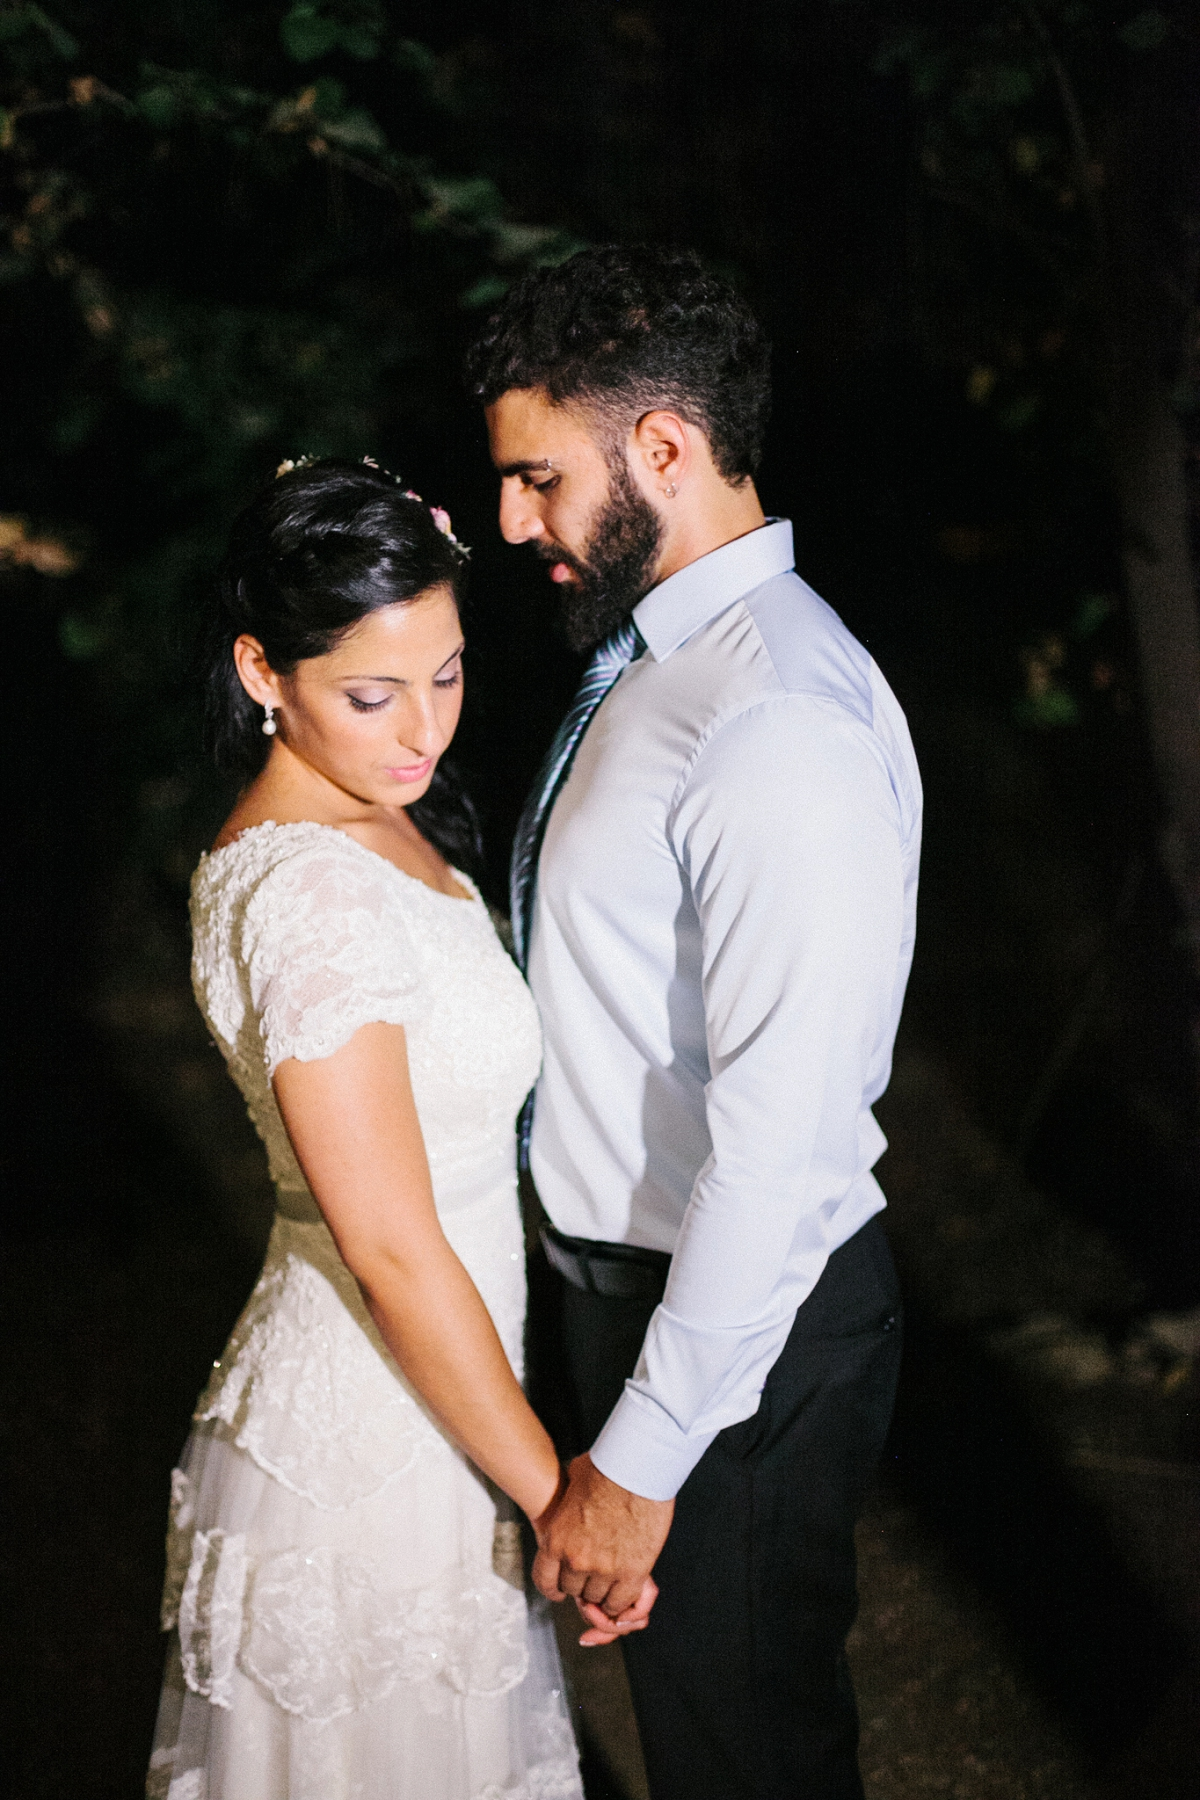 neot-kedumim-wedding-israel-shira-and-eilam-sigala-photography_0053